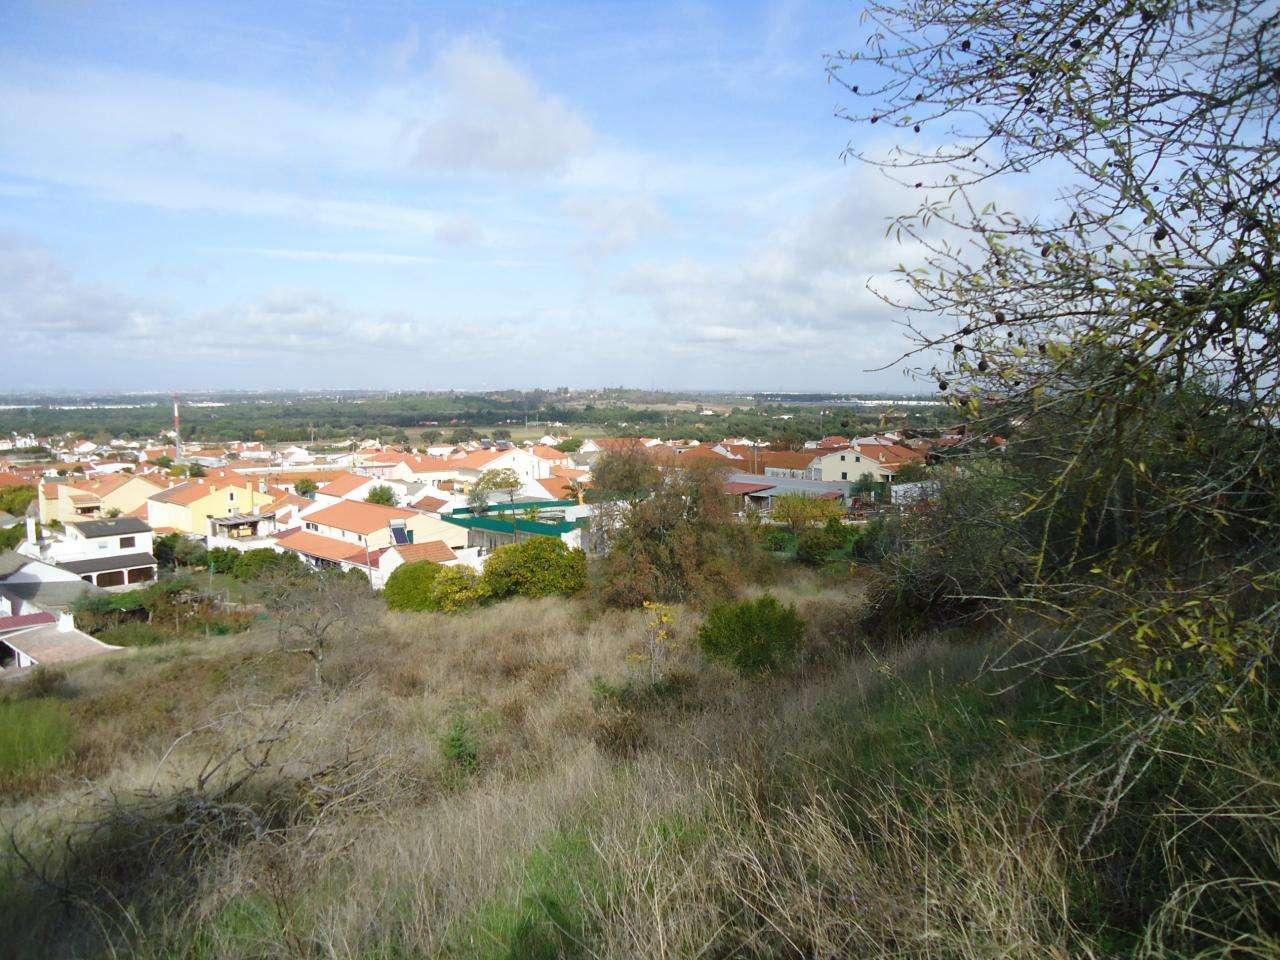 Terreno para comprar, Quinta do Anjo, Setúbal - Foto 3